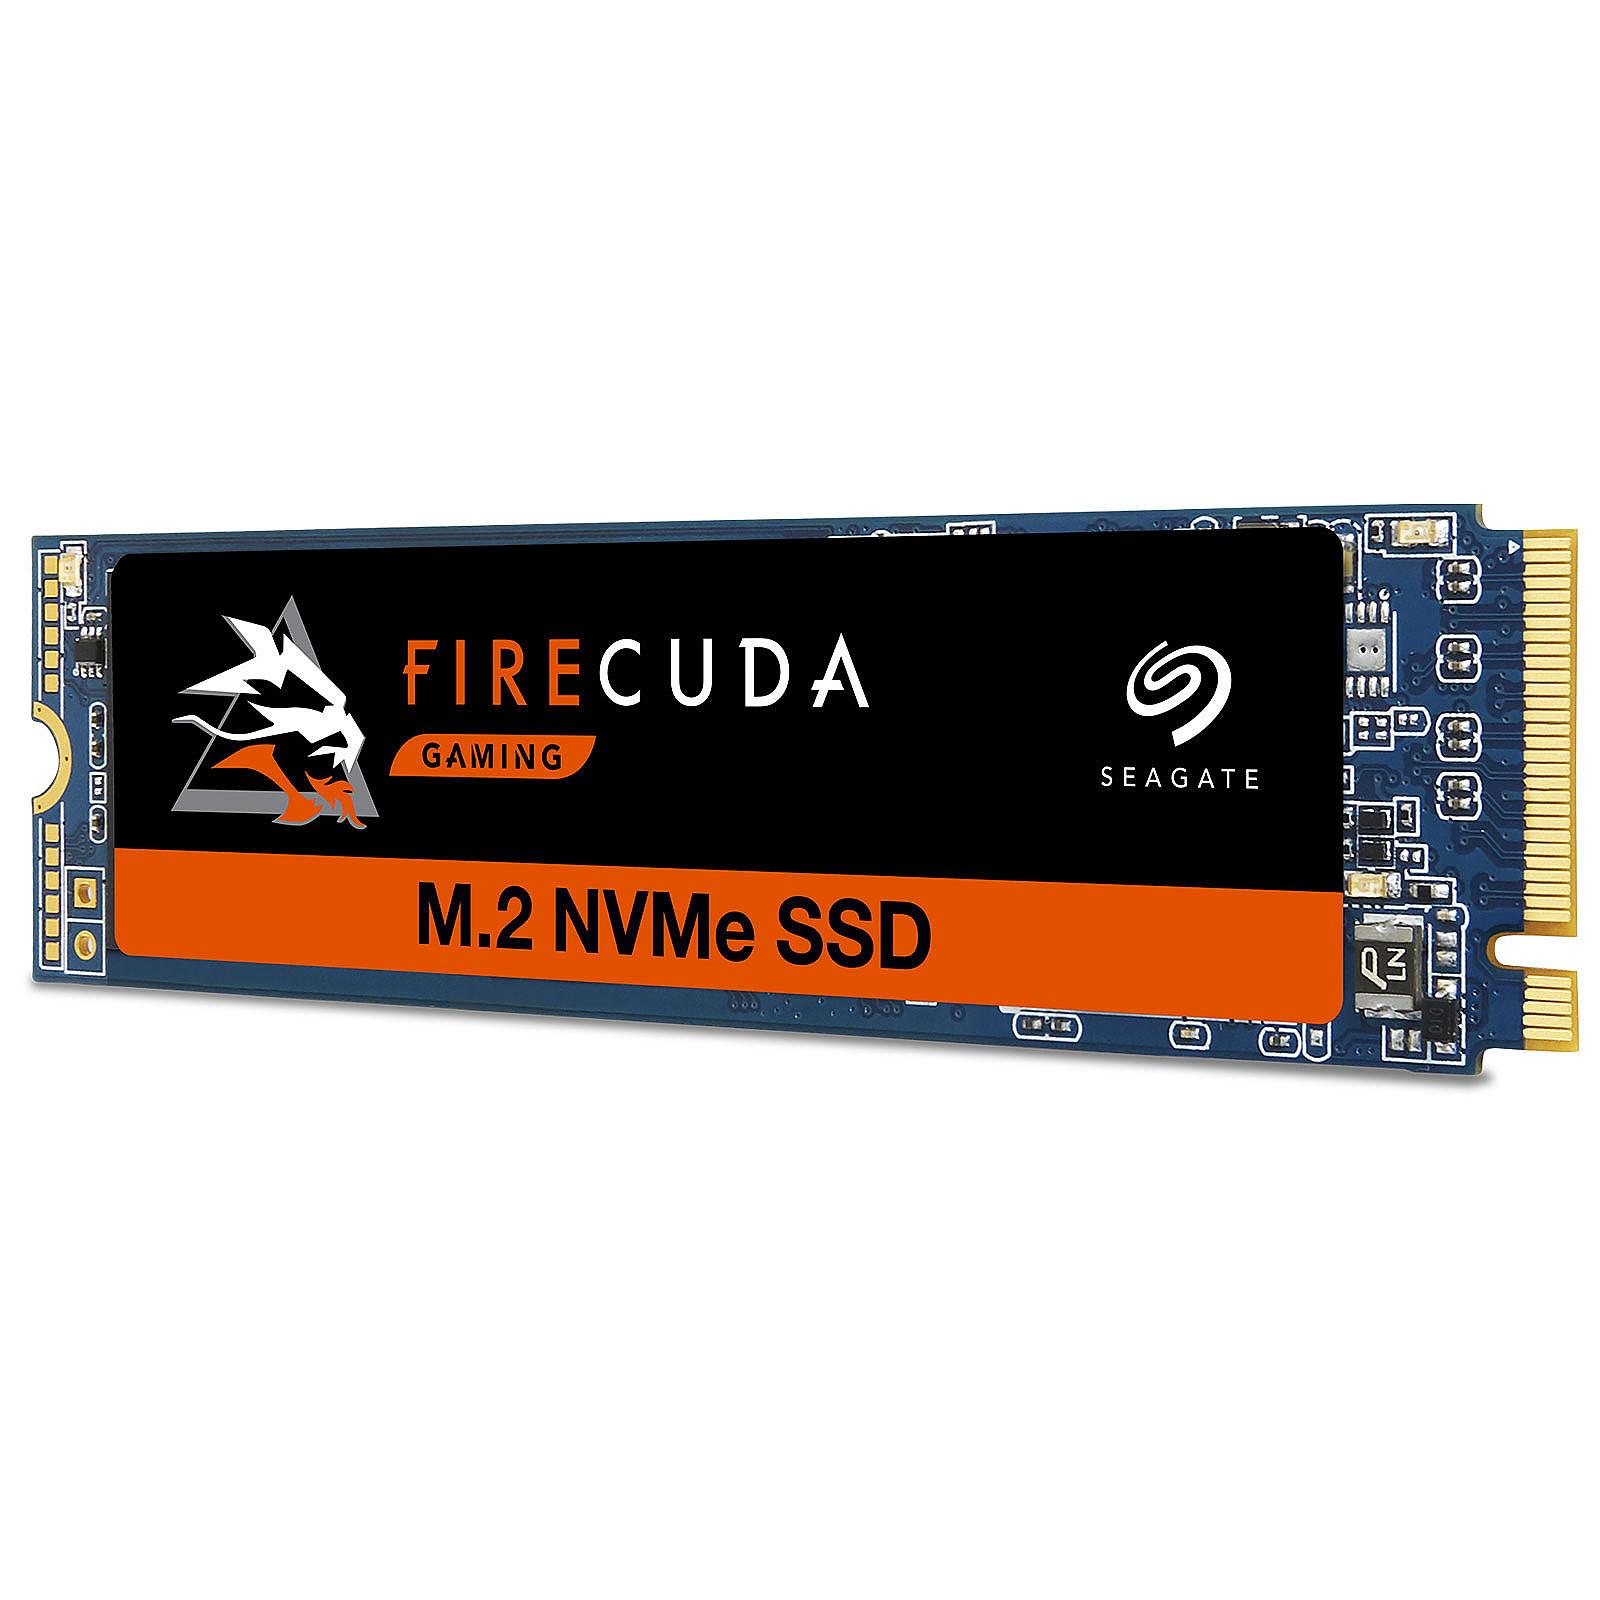 Seagate SSD FireCuda 510 M.2 PCIe NVMe 1Tb